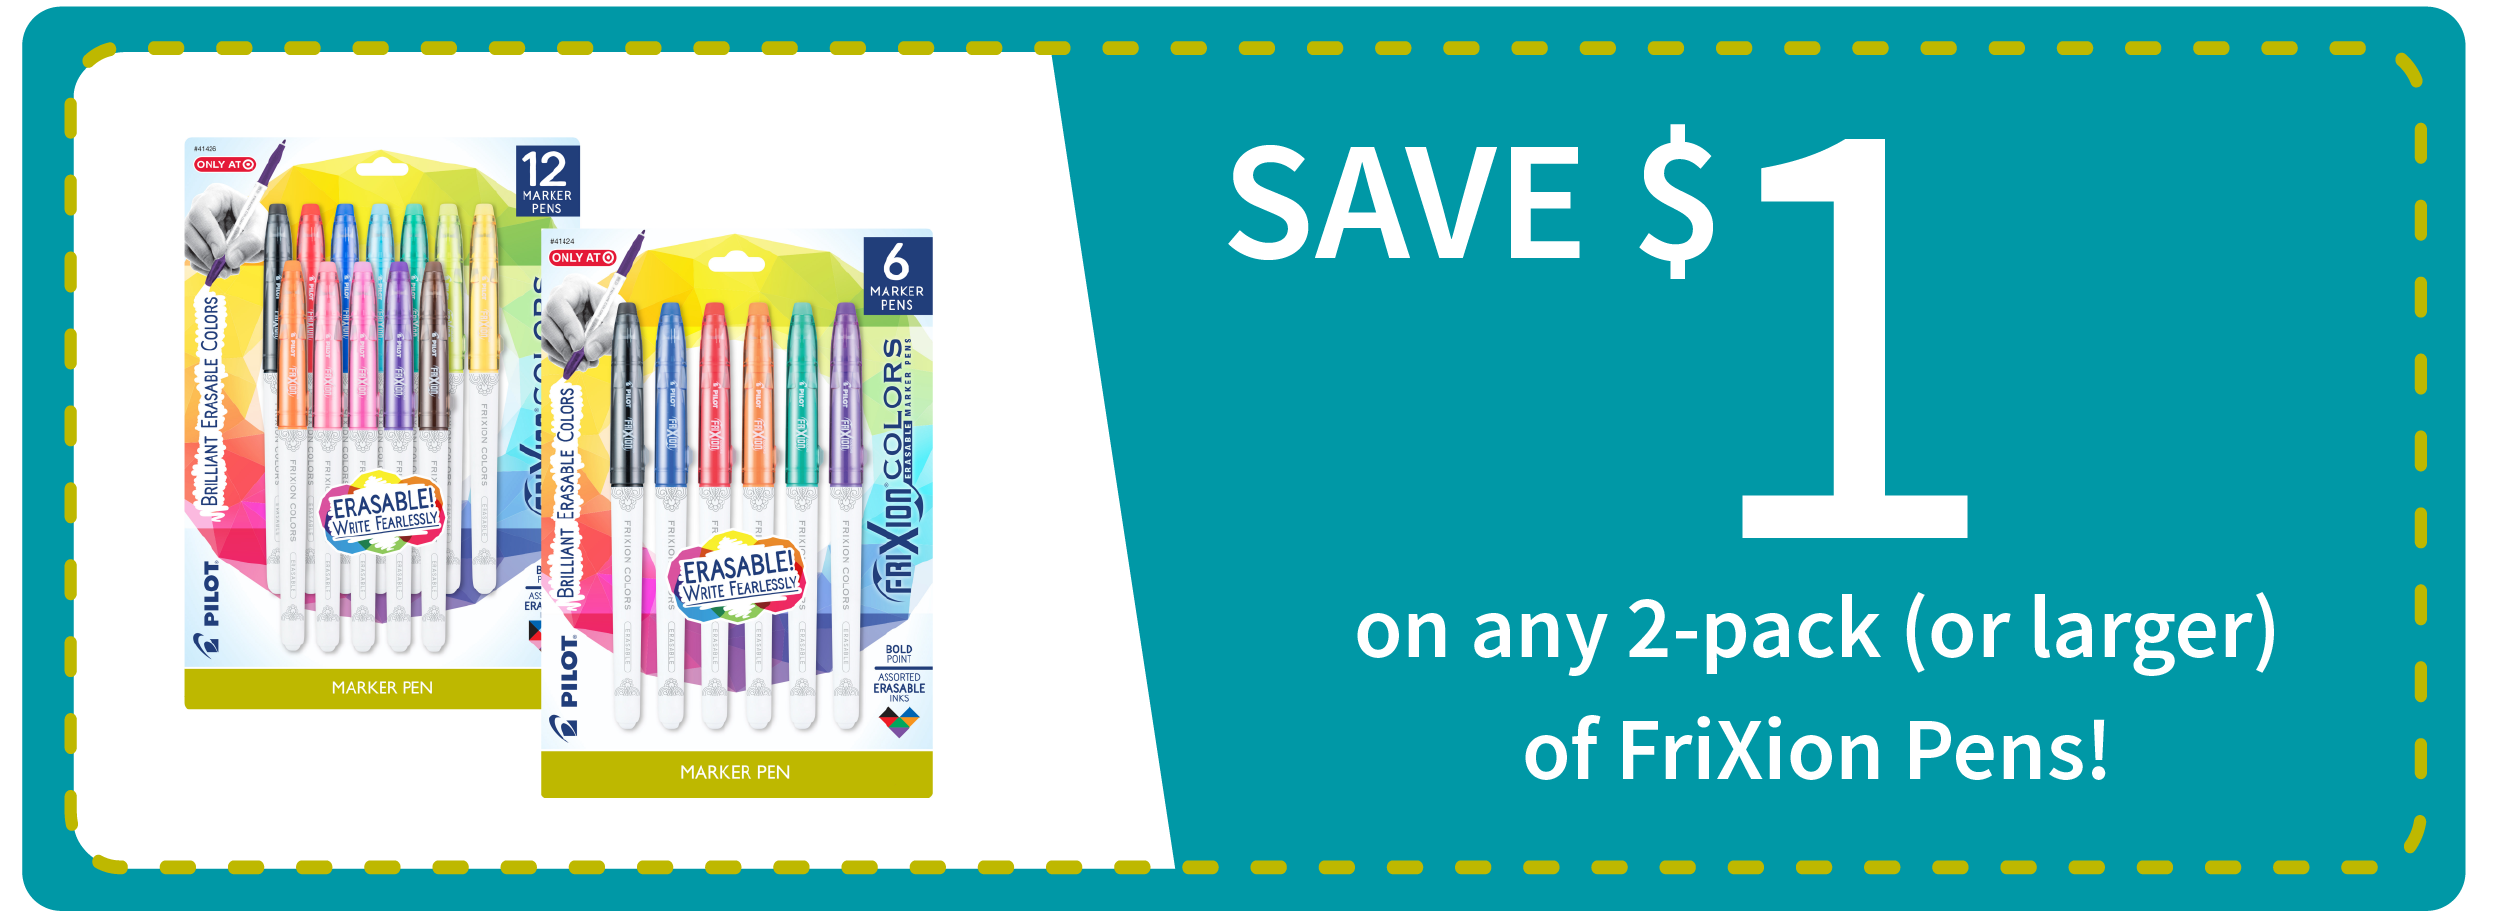 FriXion Colors Erasable Marker Pens Packs Coupon